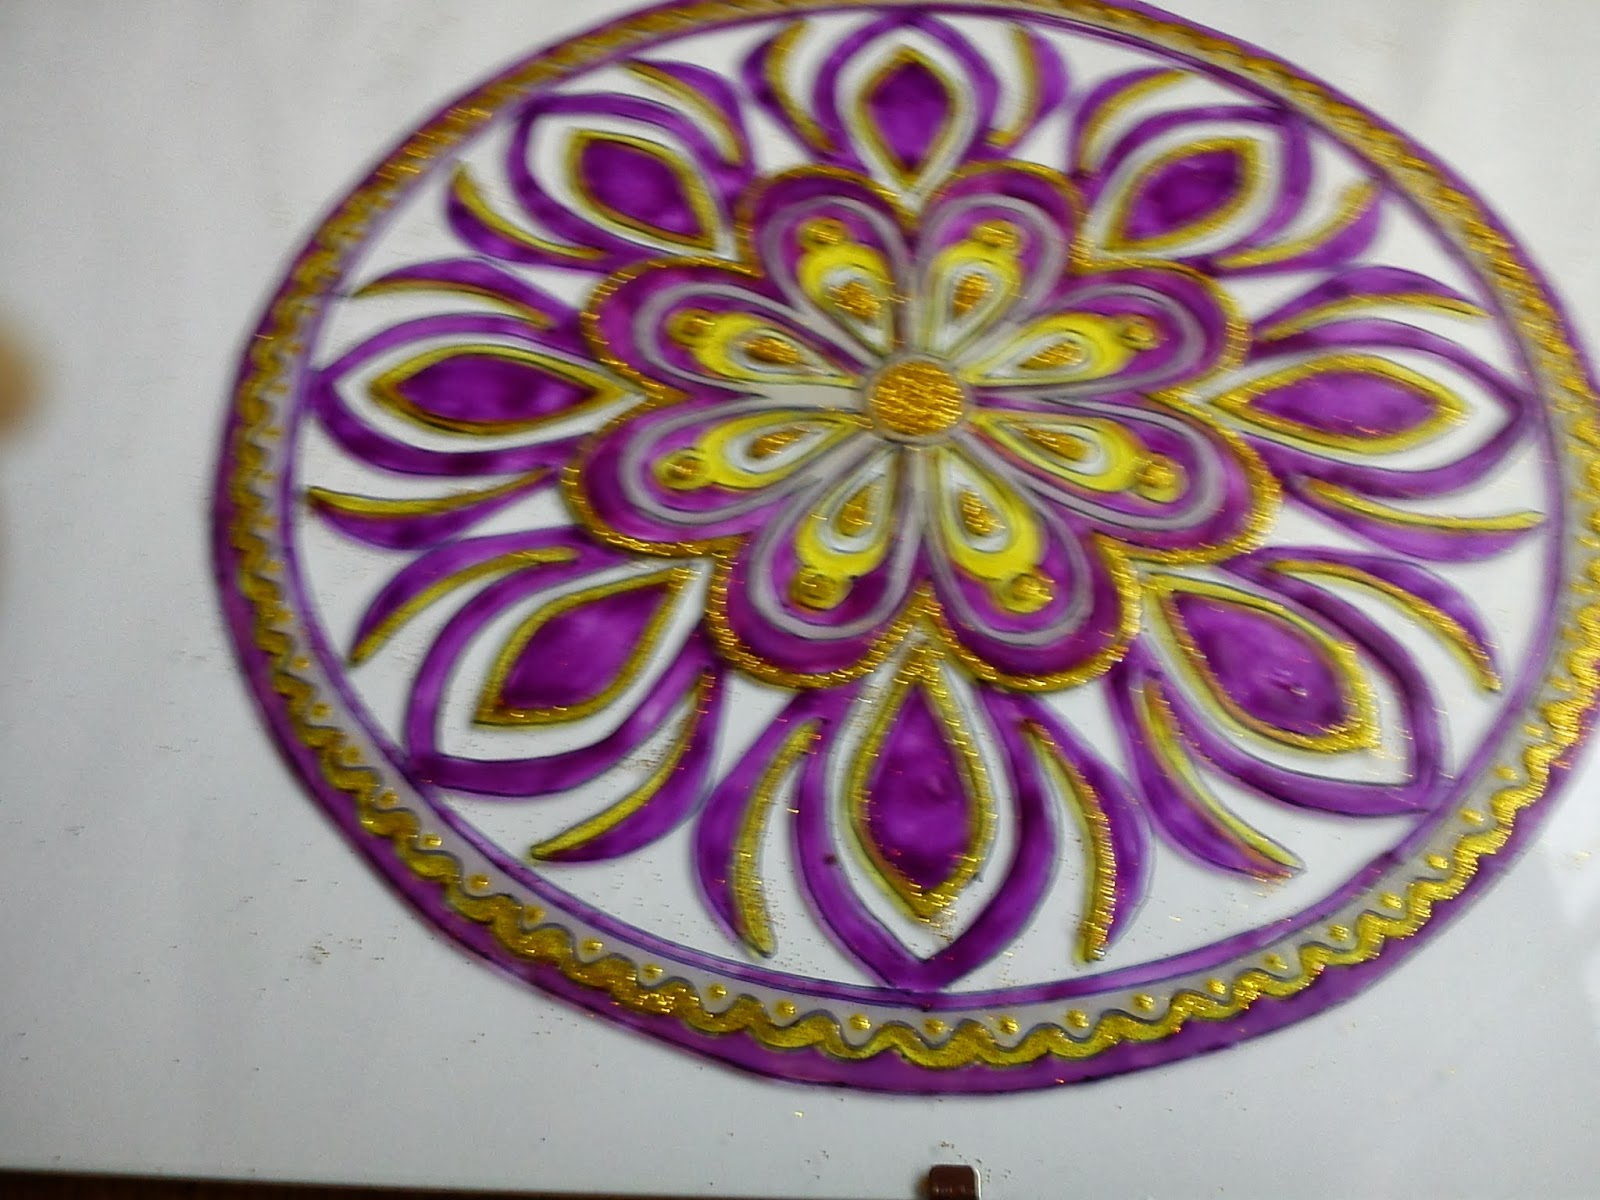 Elizabeth Tolnay's mandalas: The crown chakra